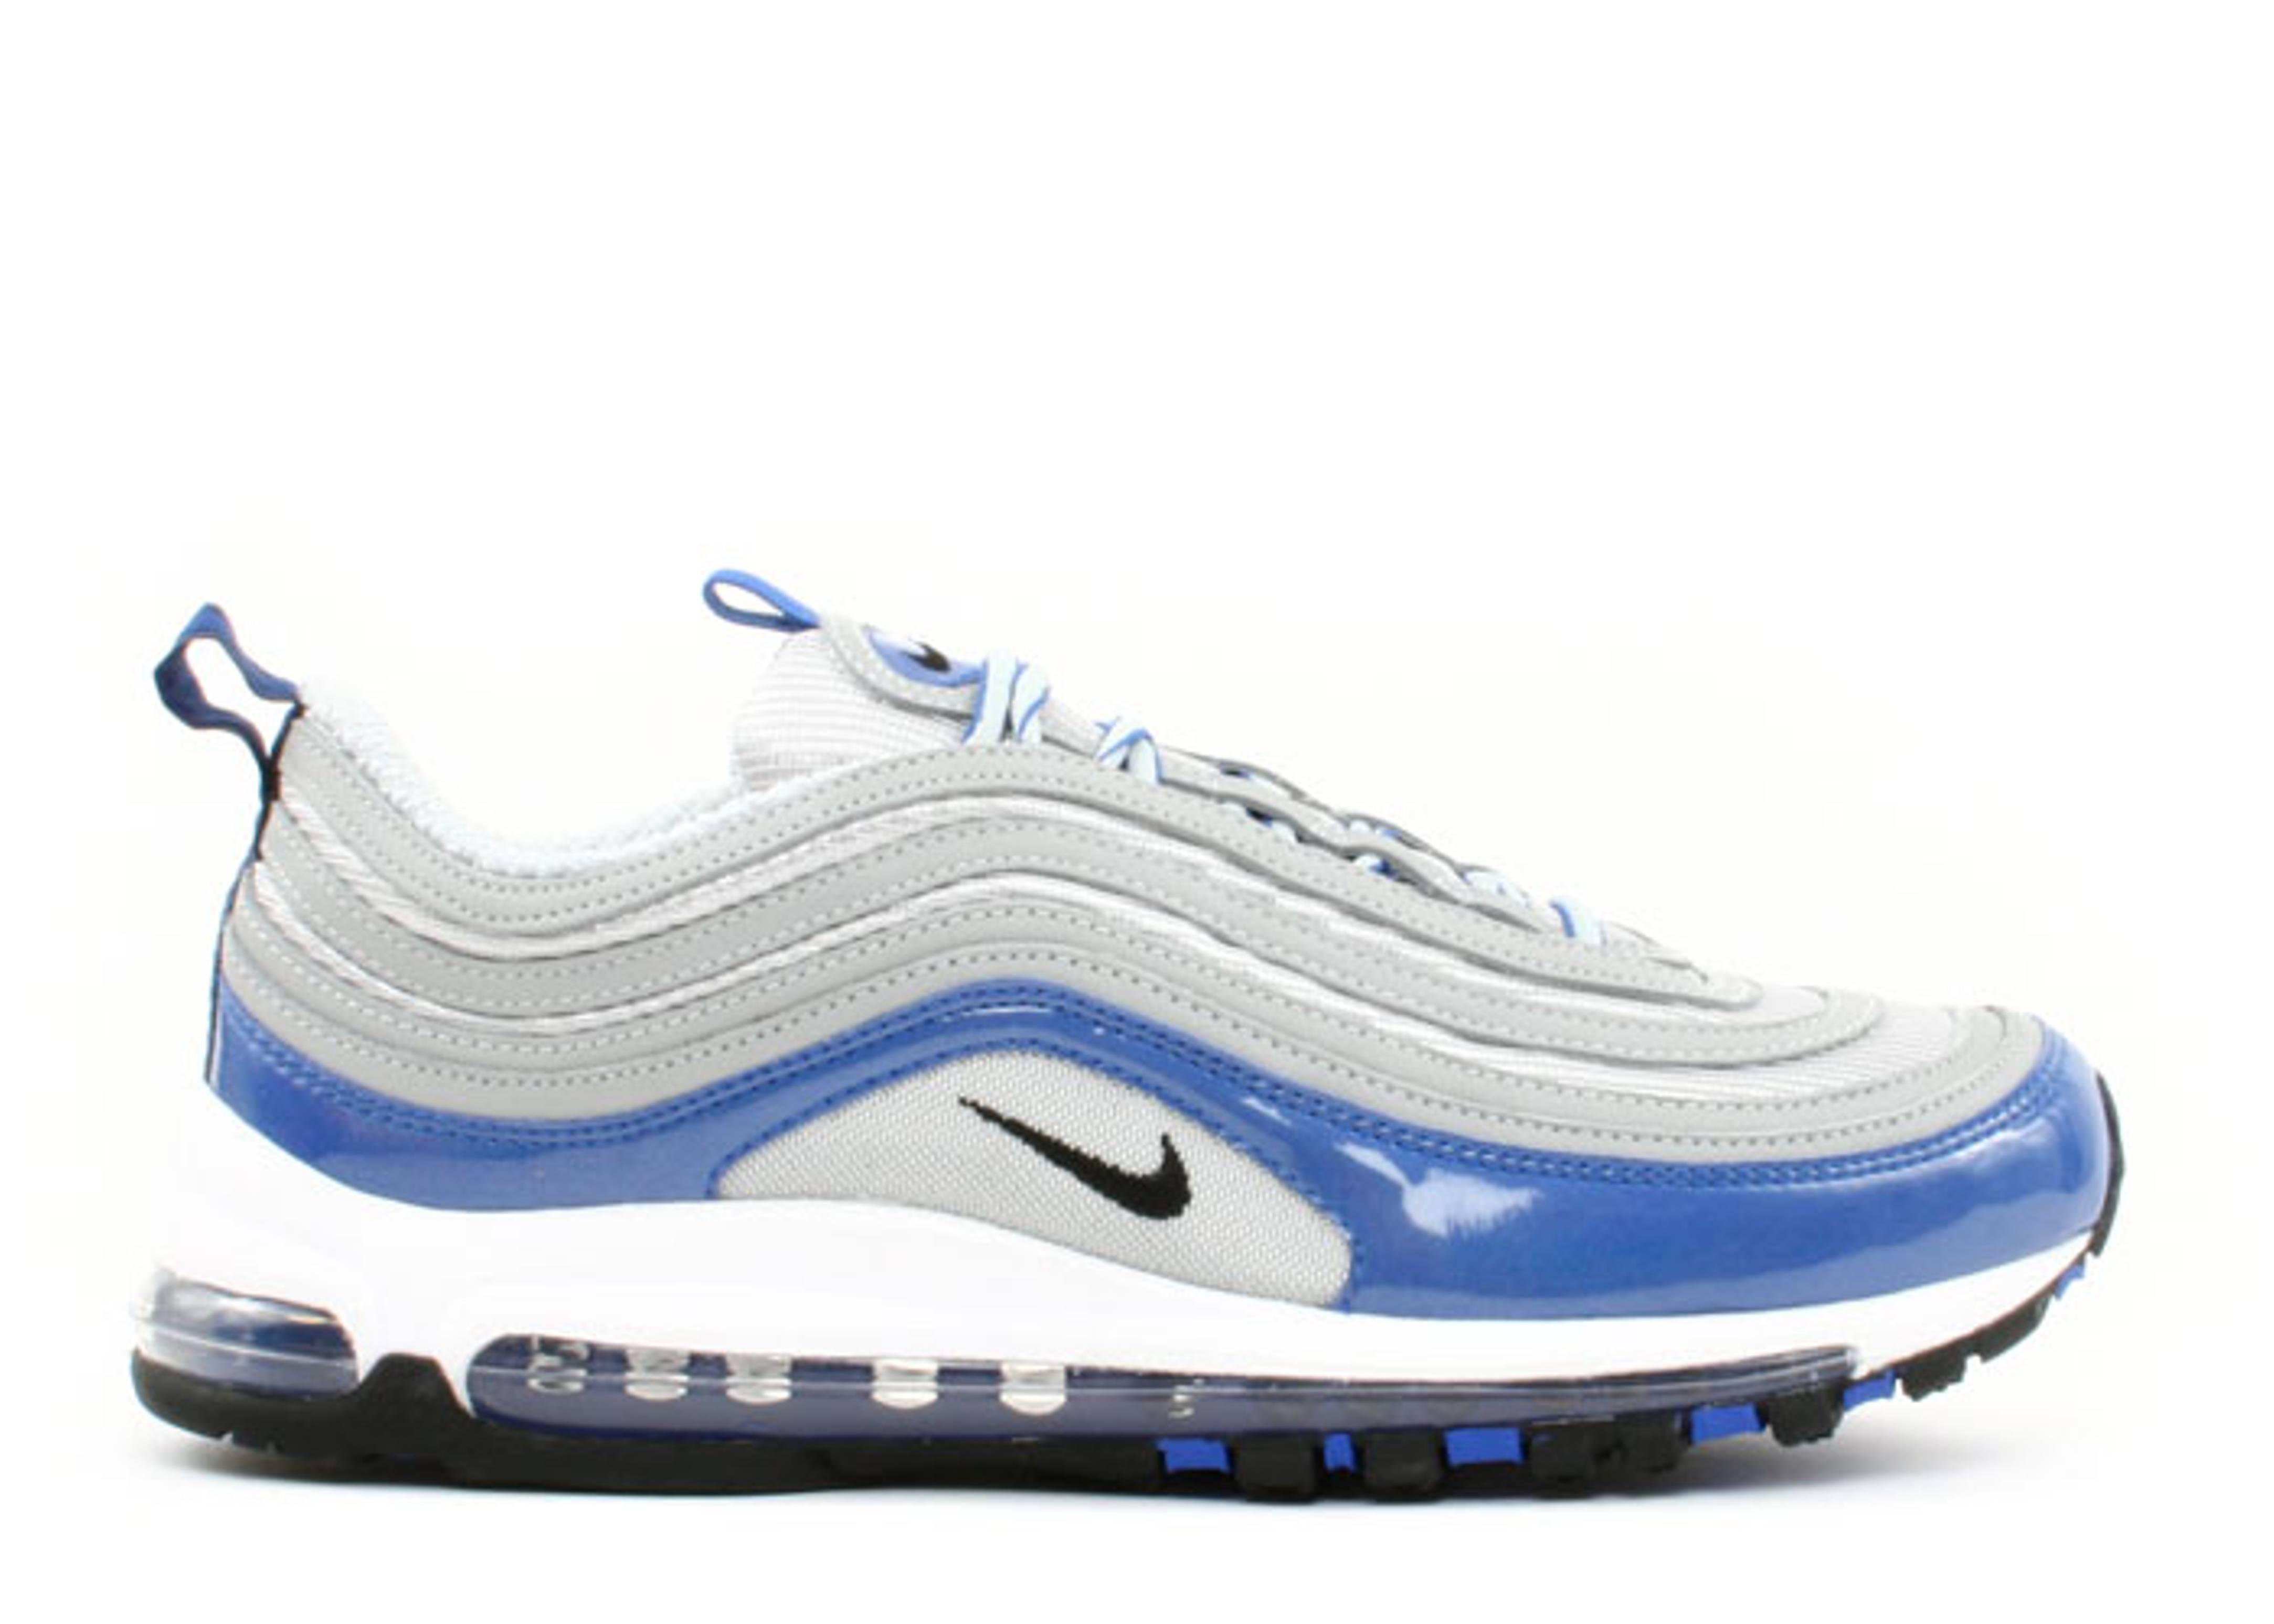 promo code 4aa02 36557 Air Max 97 Premium - Nike - 313072 001 - metallic silver ...